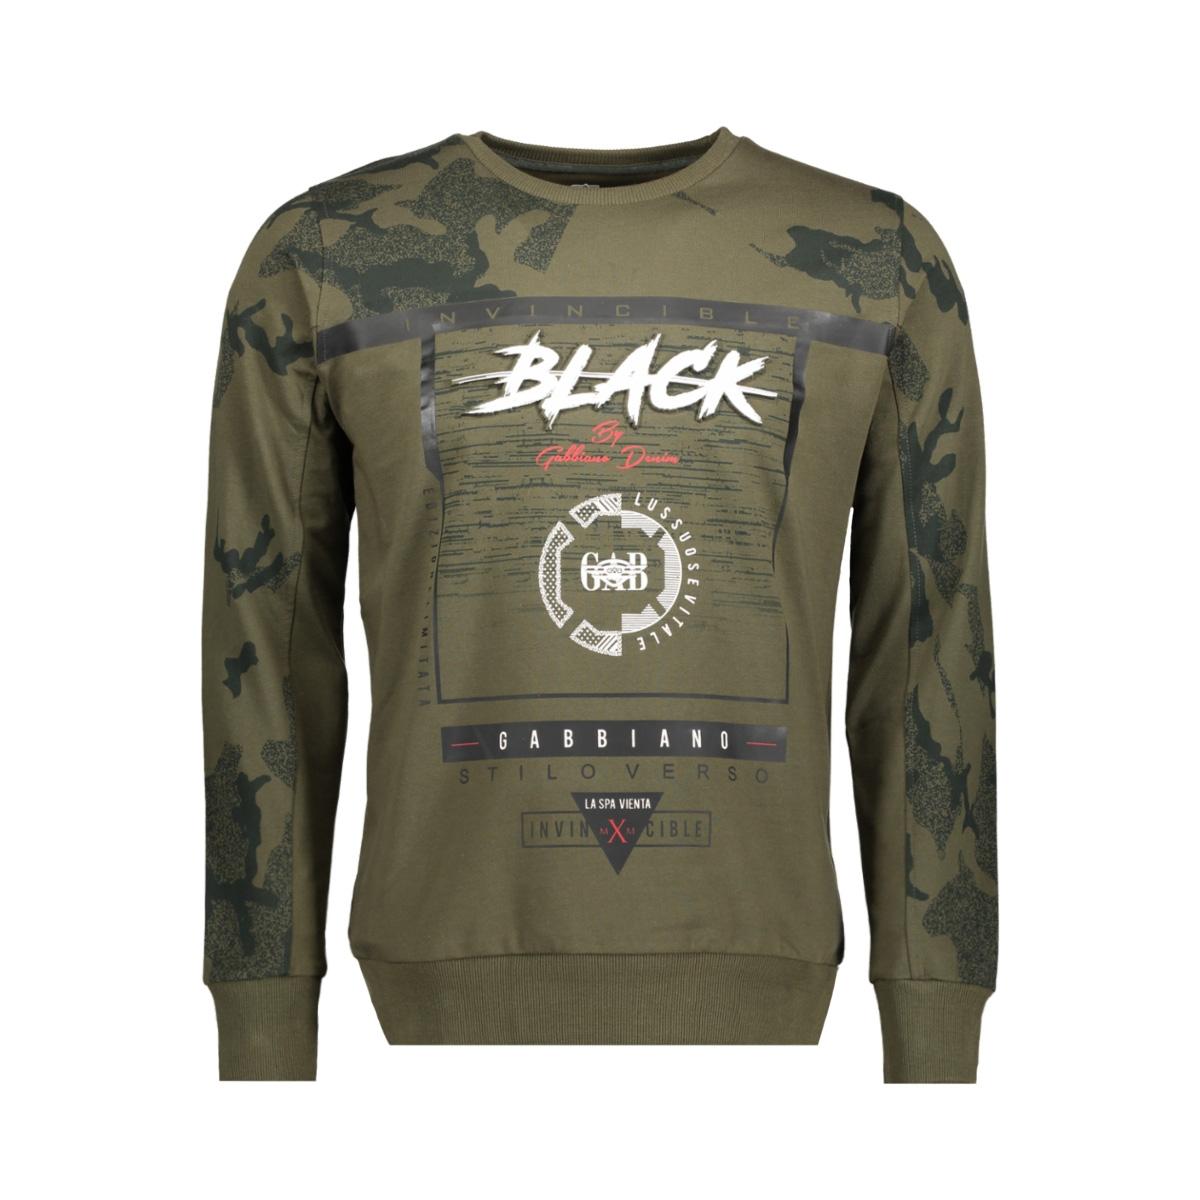 76104 gabbiano sweater army